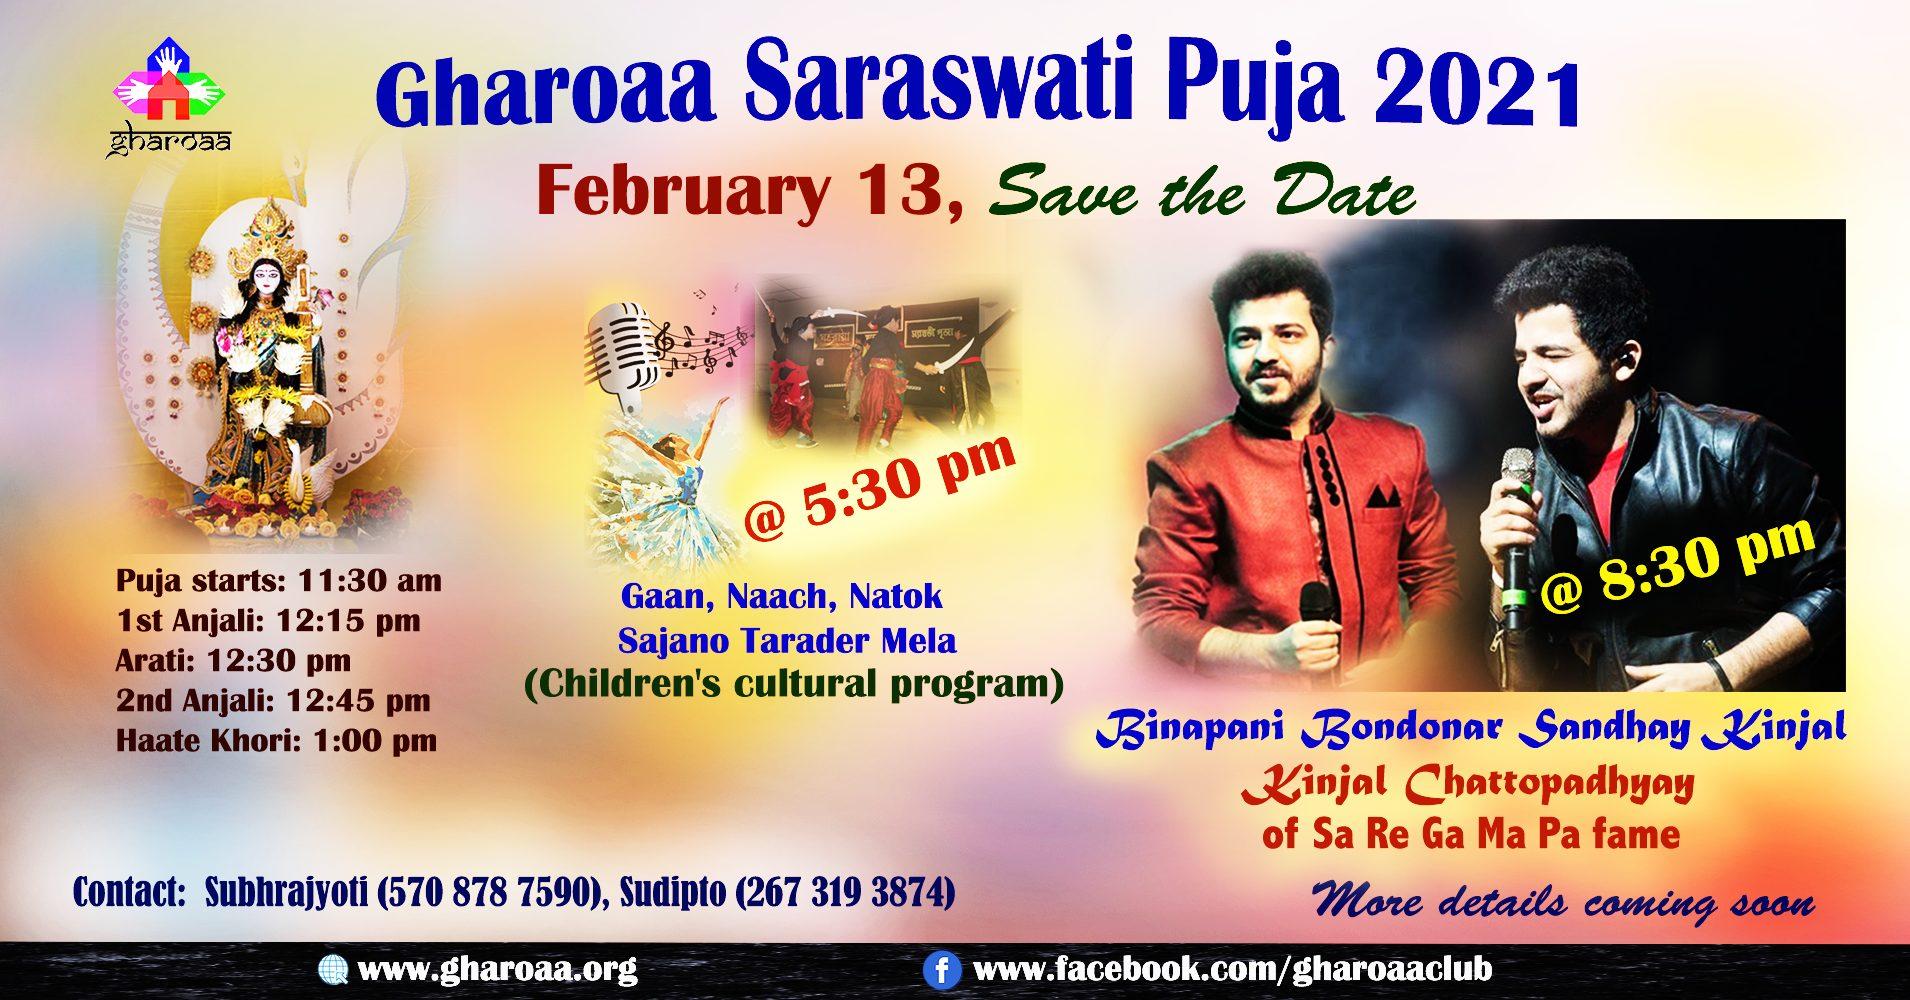 SaraswatiPuja_Poster_2021